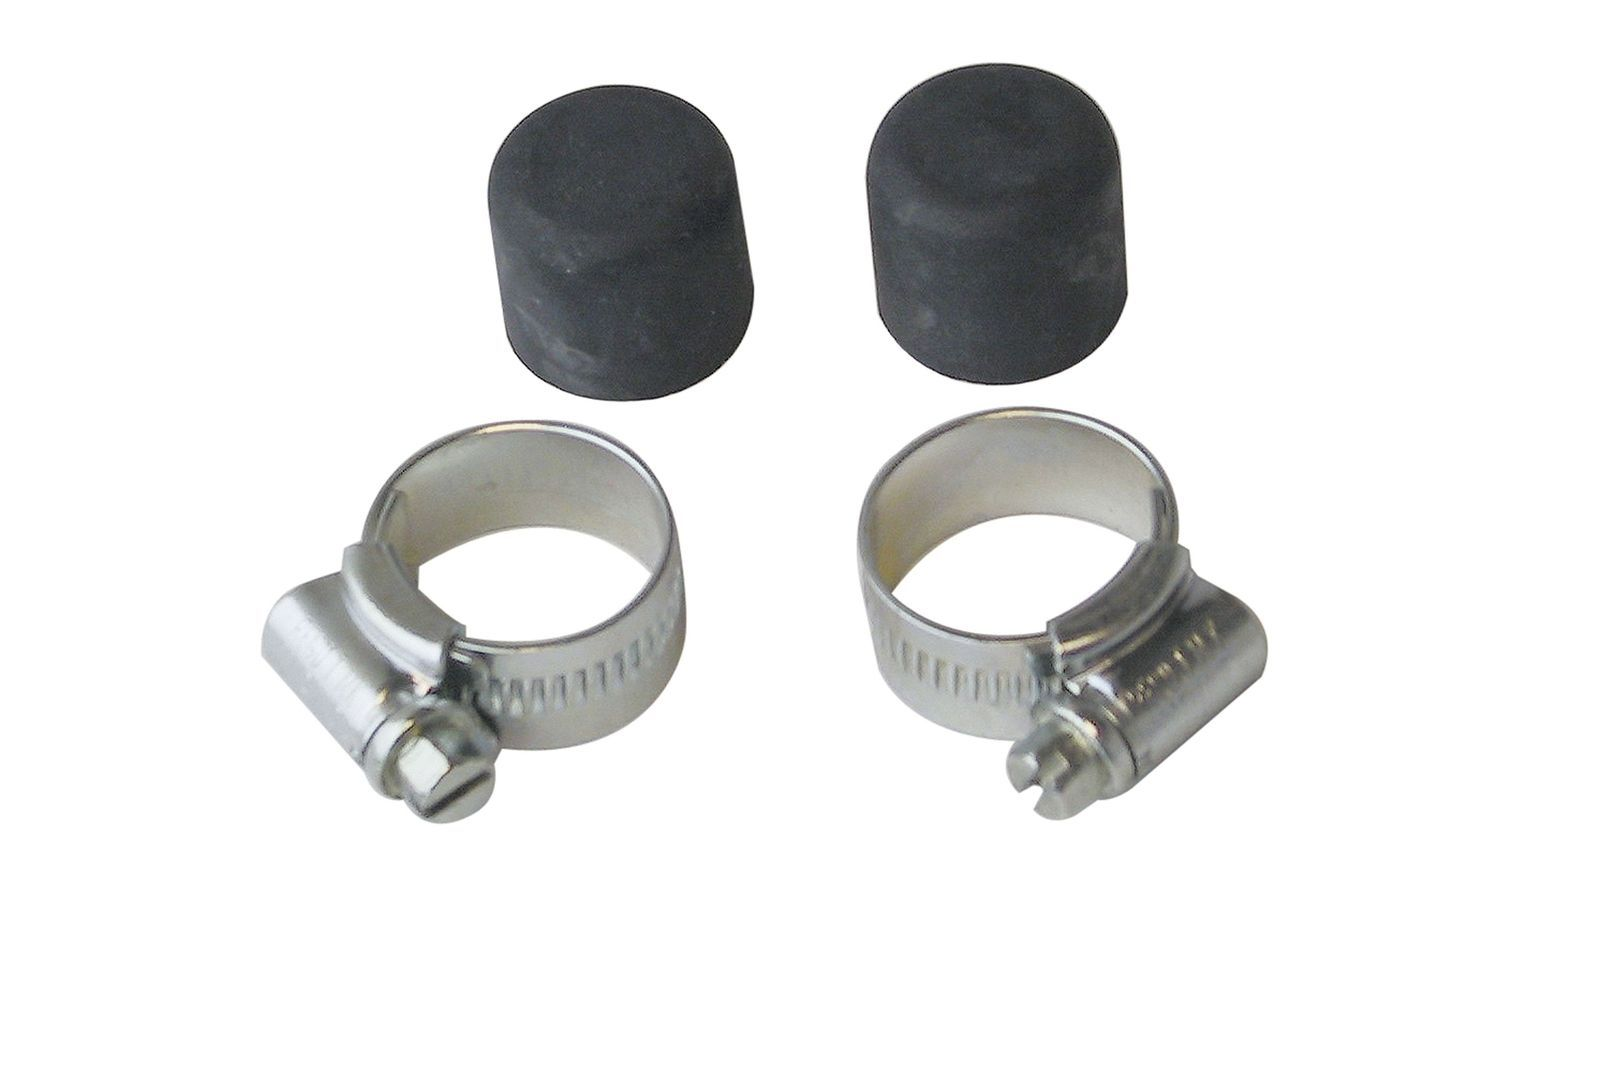 #Abklemm-Satz Thermostat-Umlaufschlauch Mini, Midget, Sprite , AJJ4013